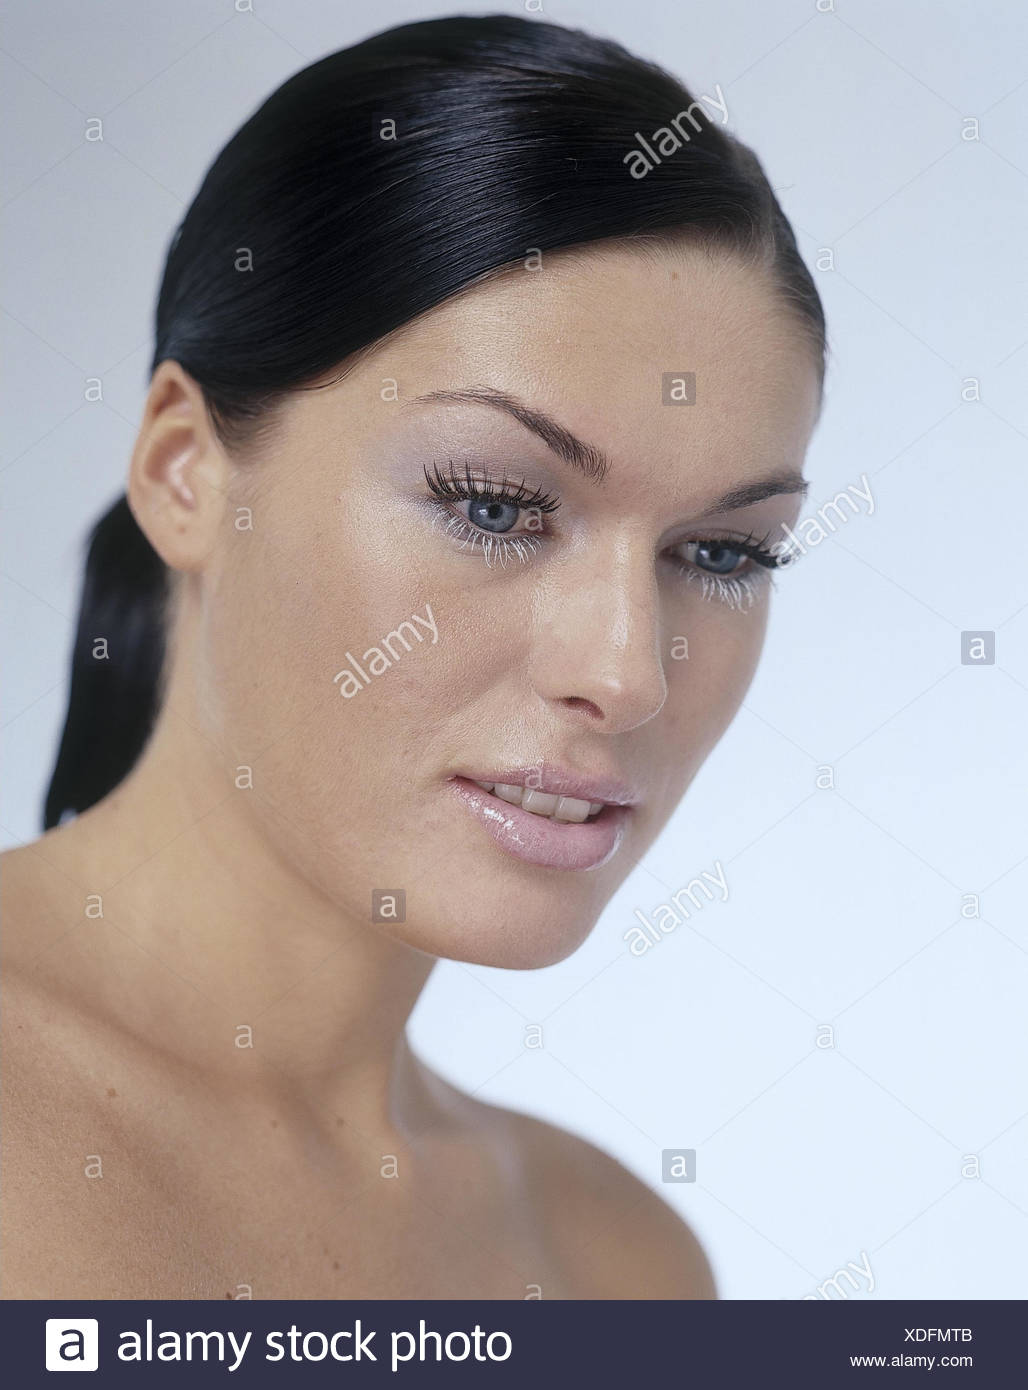 Frau Jung Make Up Diskret Portrait Studio Cut Outs Ausdruck